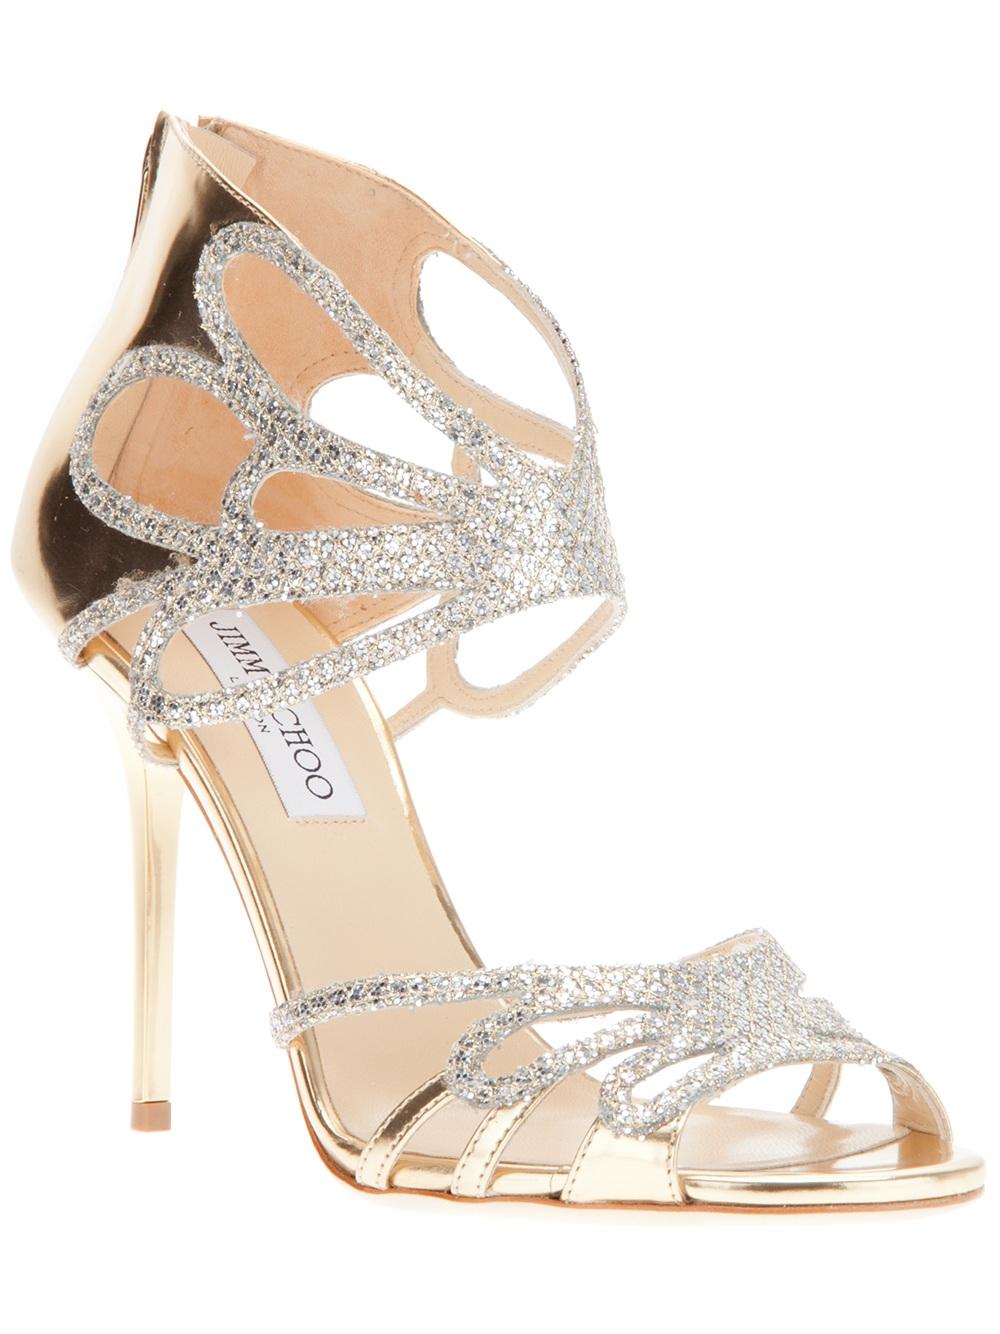 Lyst Jimmy Choo Metallic Sandal In Metallic